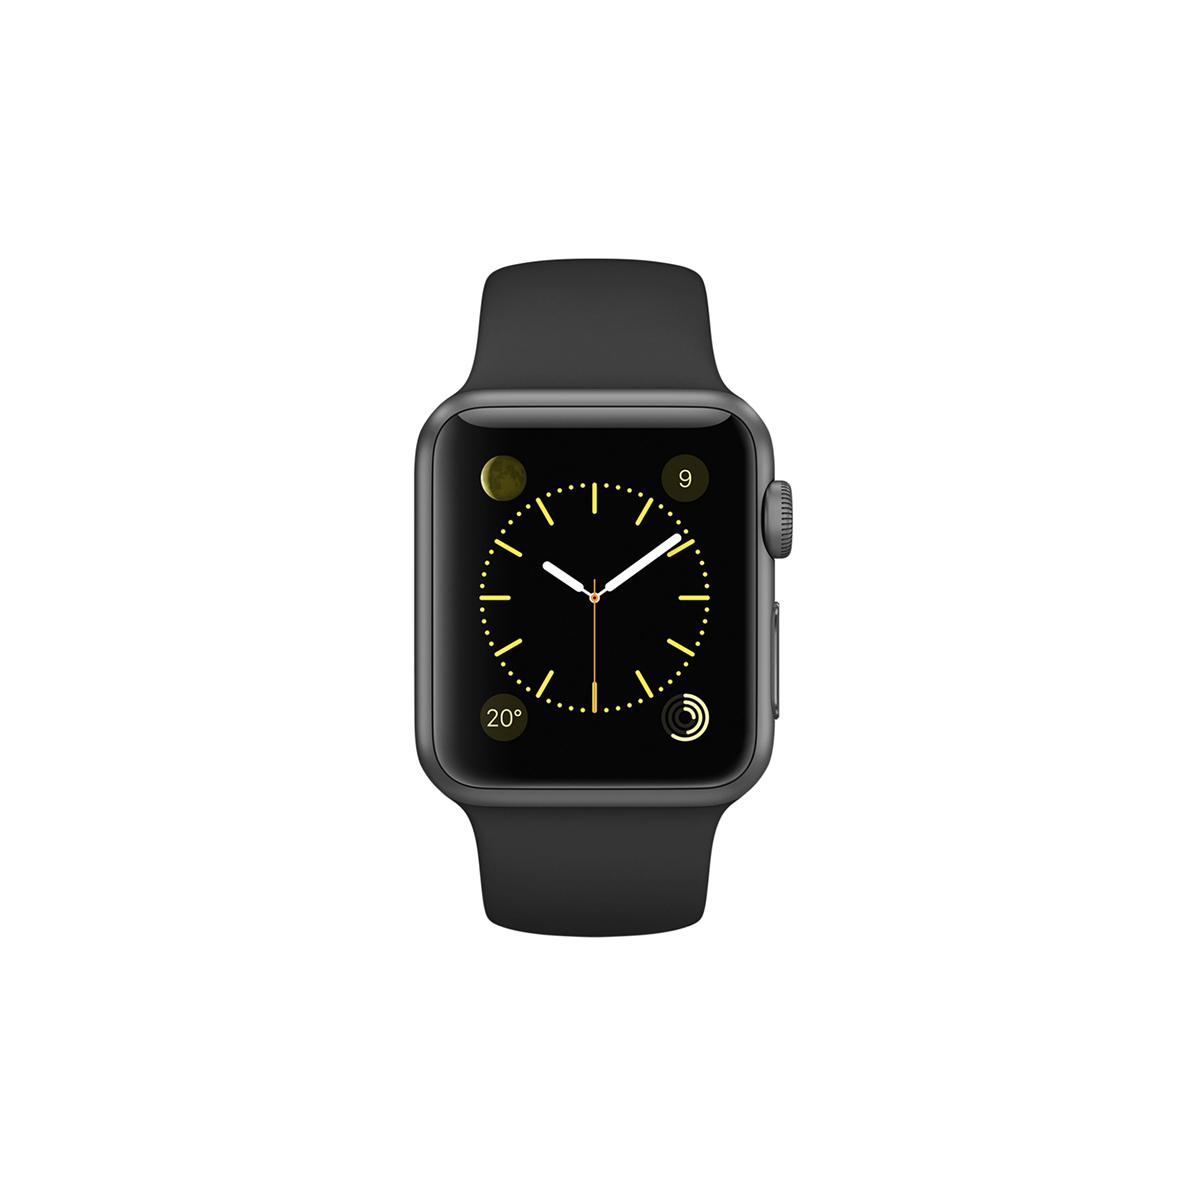 Apple/苹果 Apple Watch 深空黑色铝金属表壳搭配黑色运动型表带